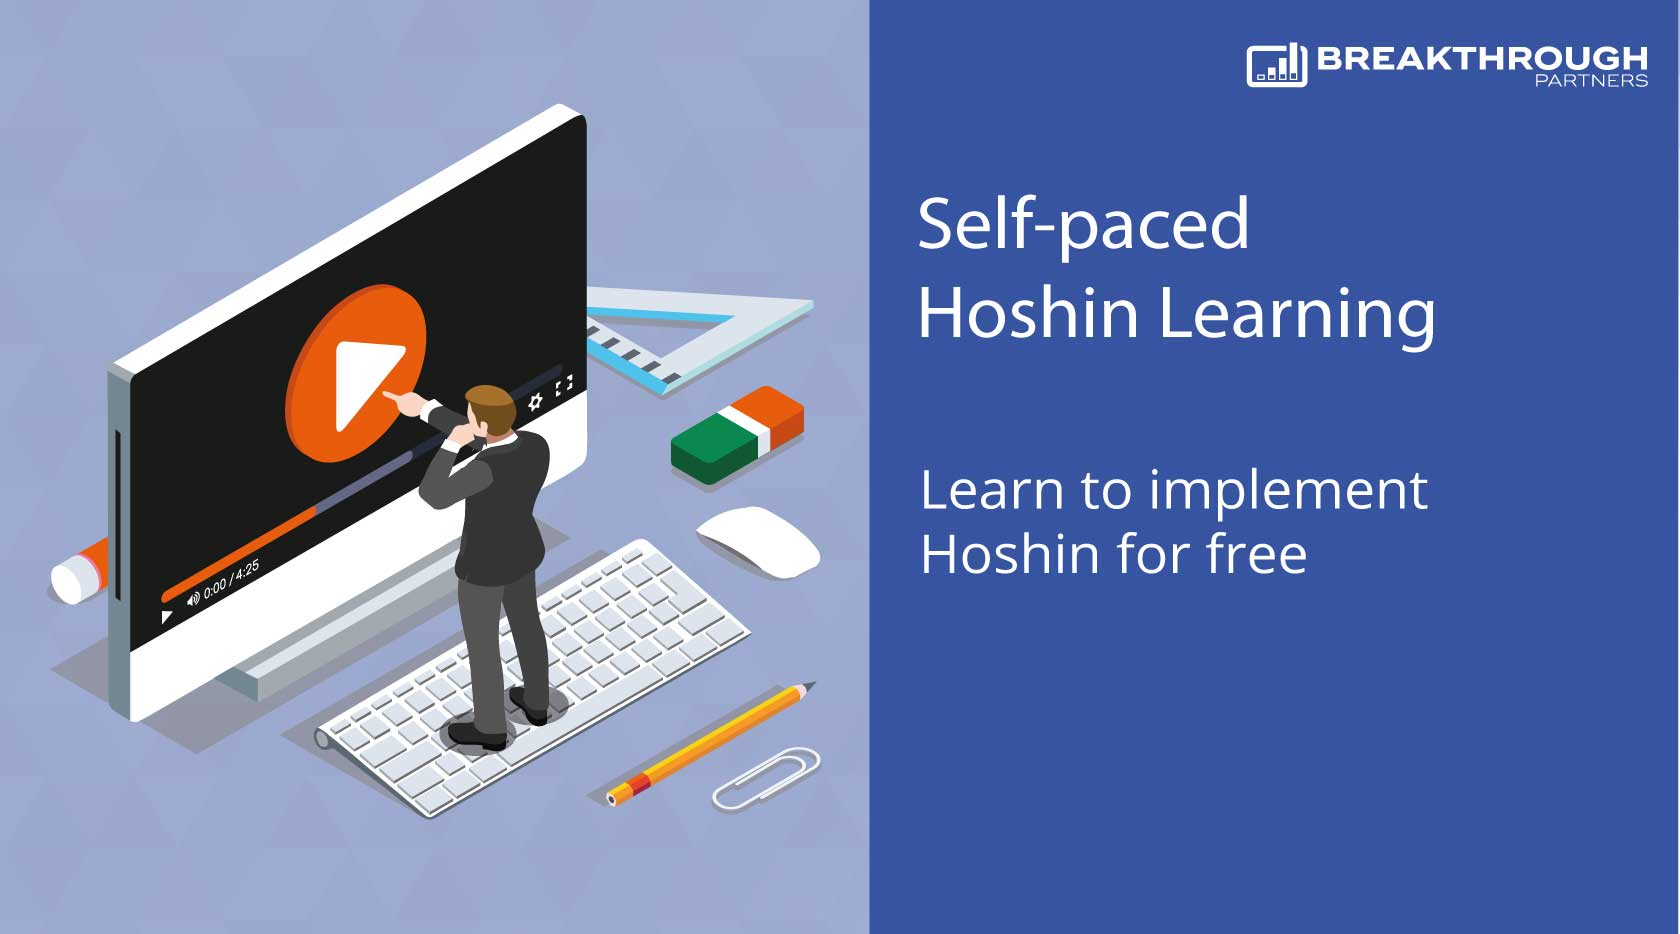 Self-paced Hoshin eLearning